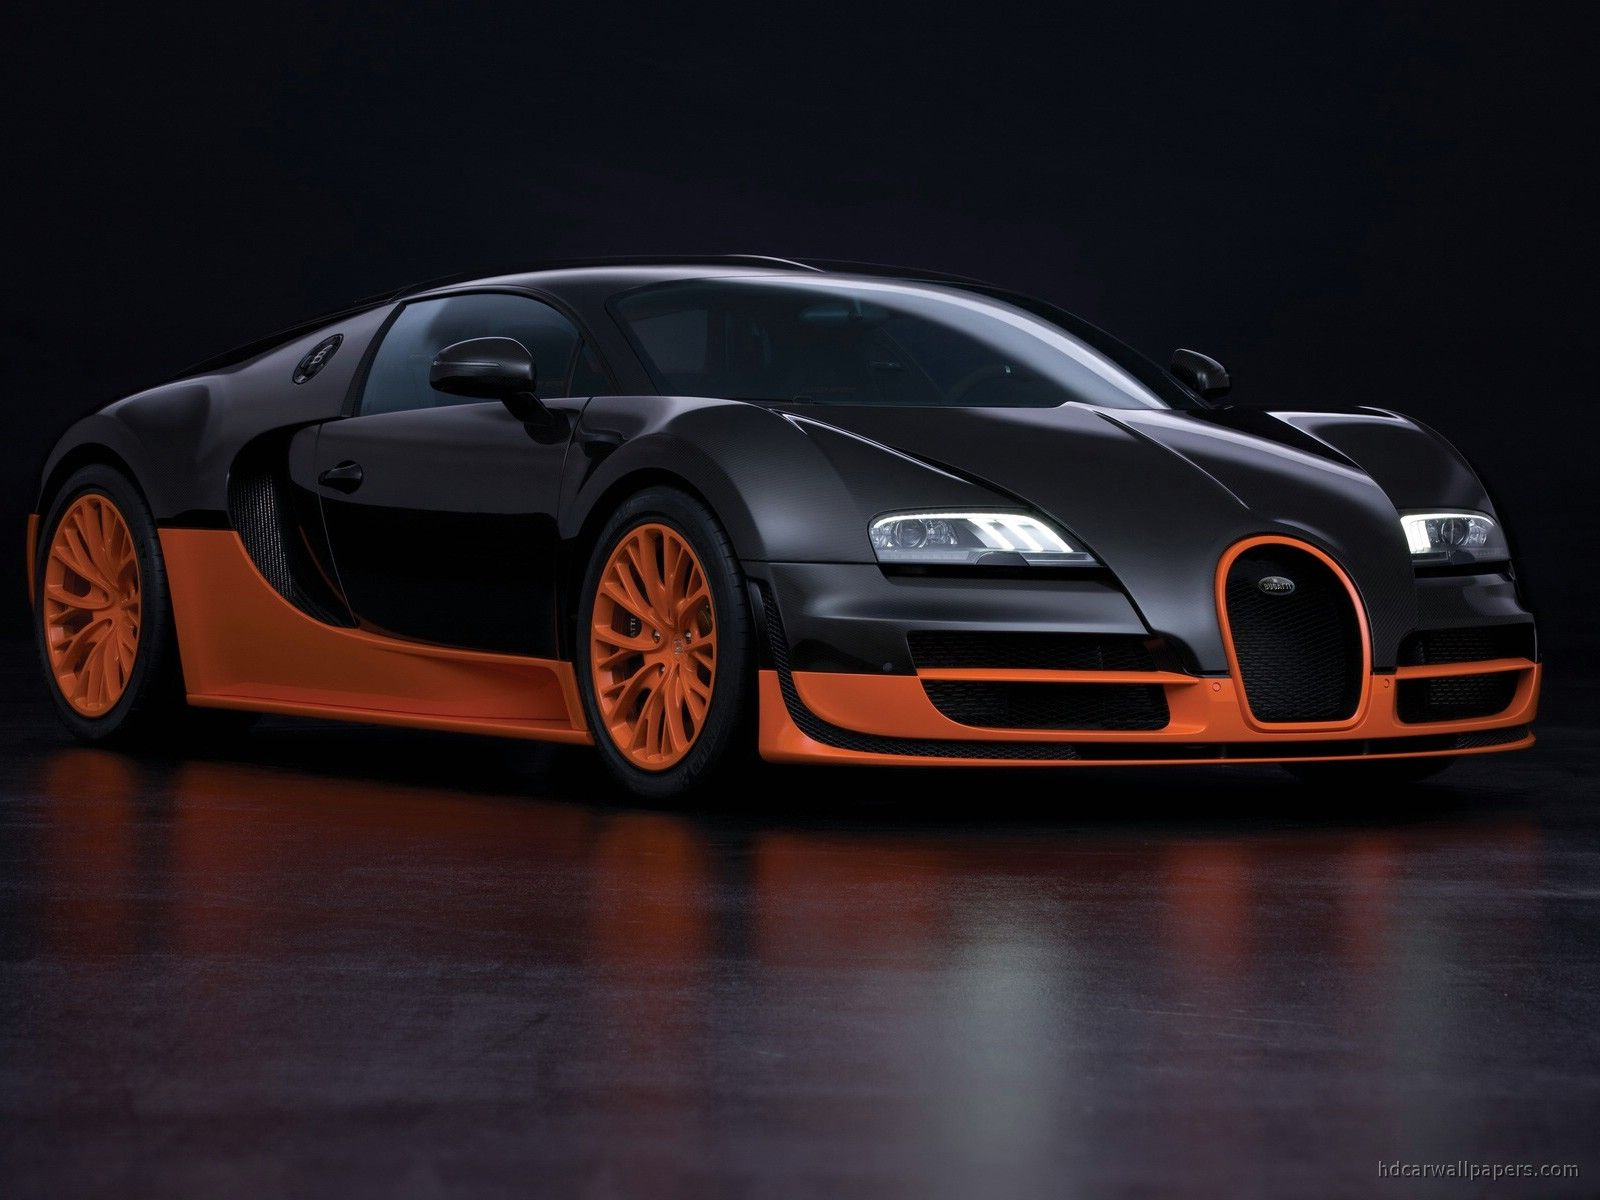 4d1029782cdfe8866558b16d4d8247b1 Inspiring Bugatti Veyron Price Australian Dollars Cars Trend